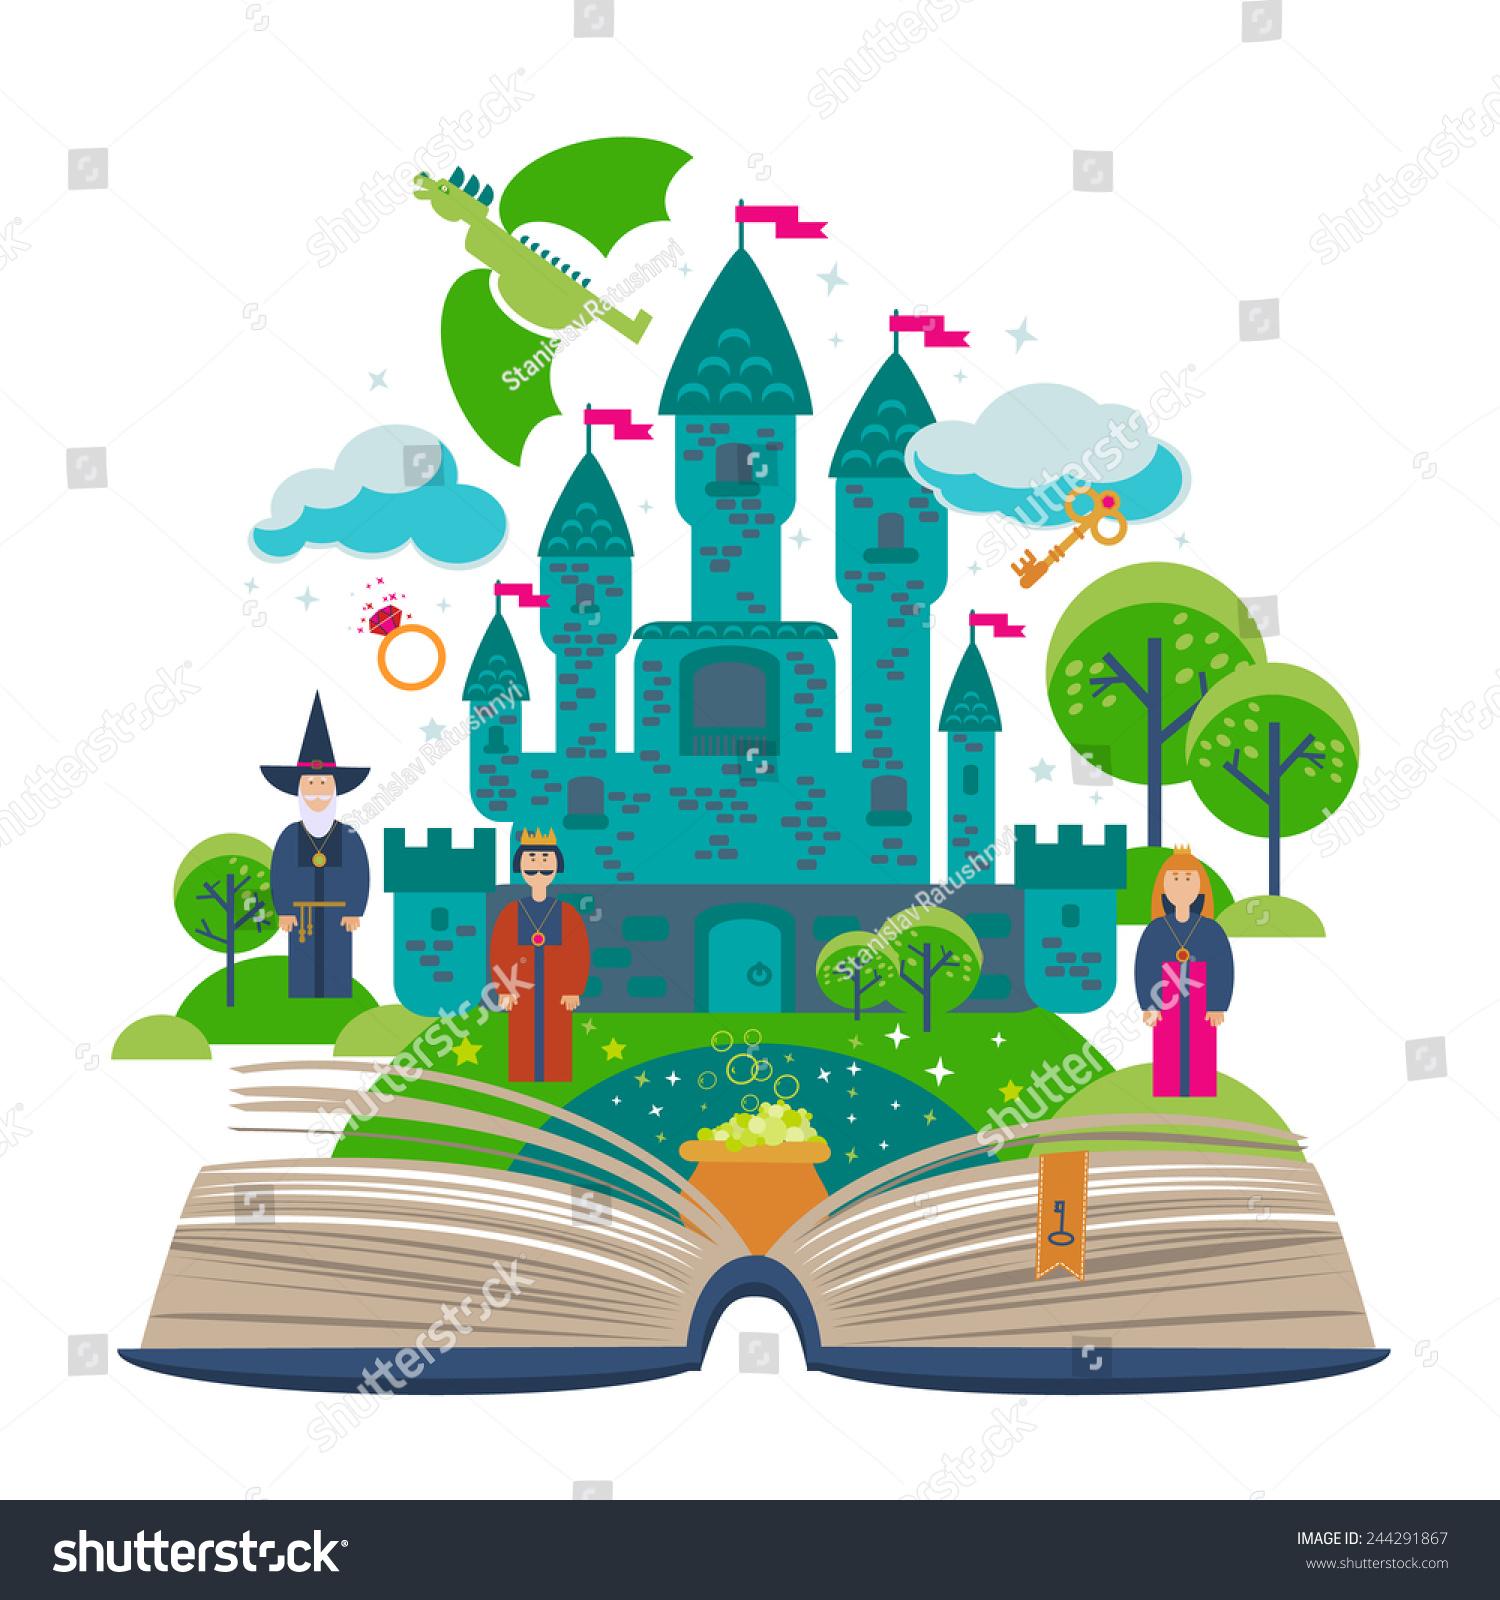 Fantasy clipart book. Portal